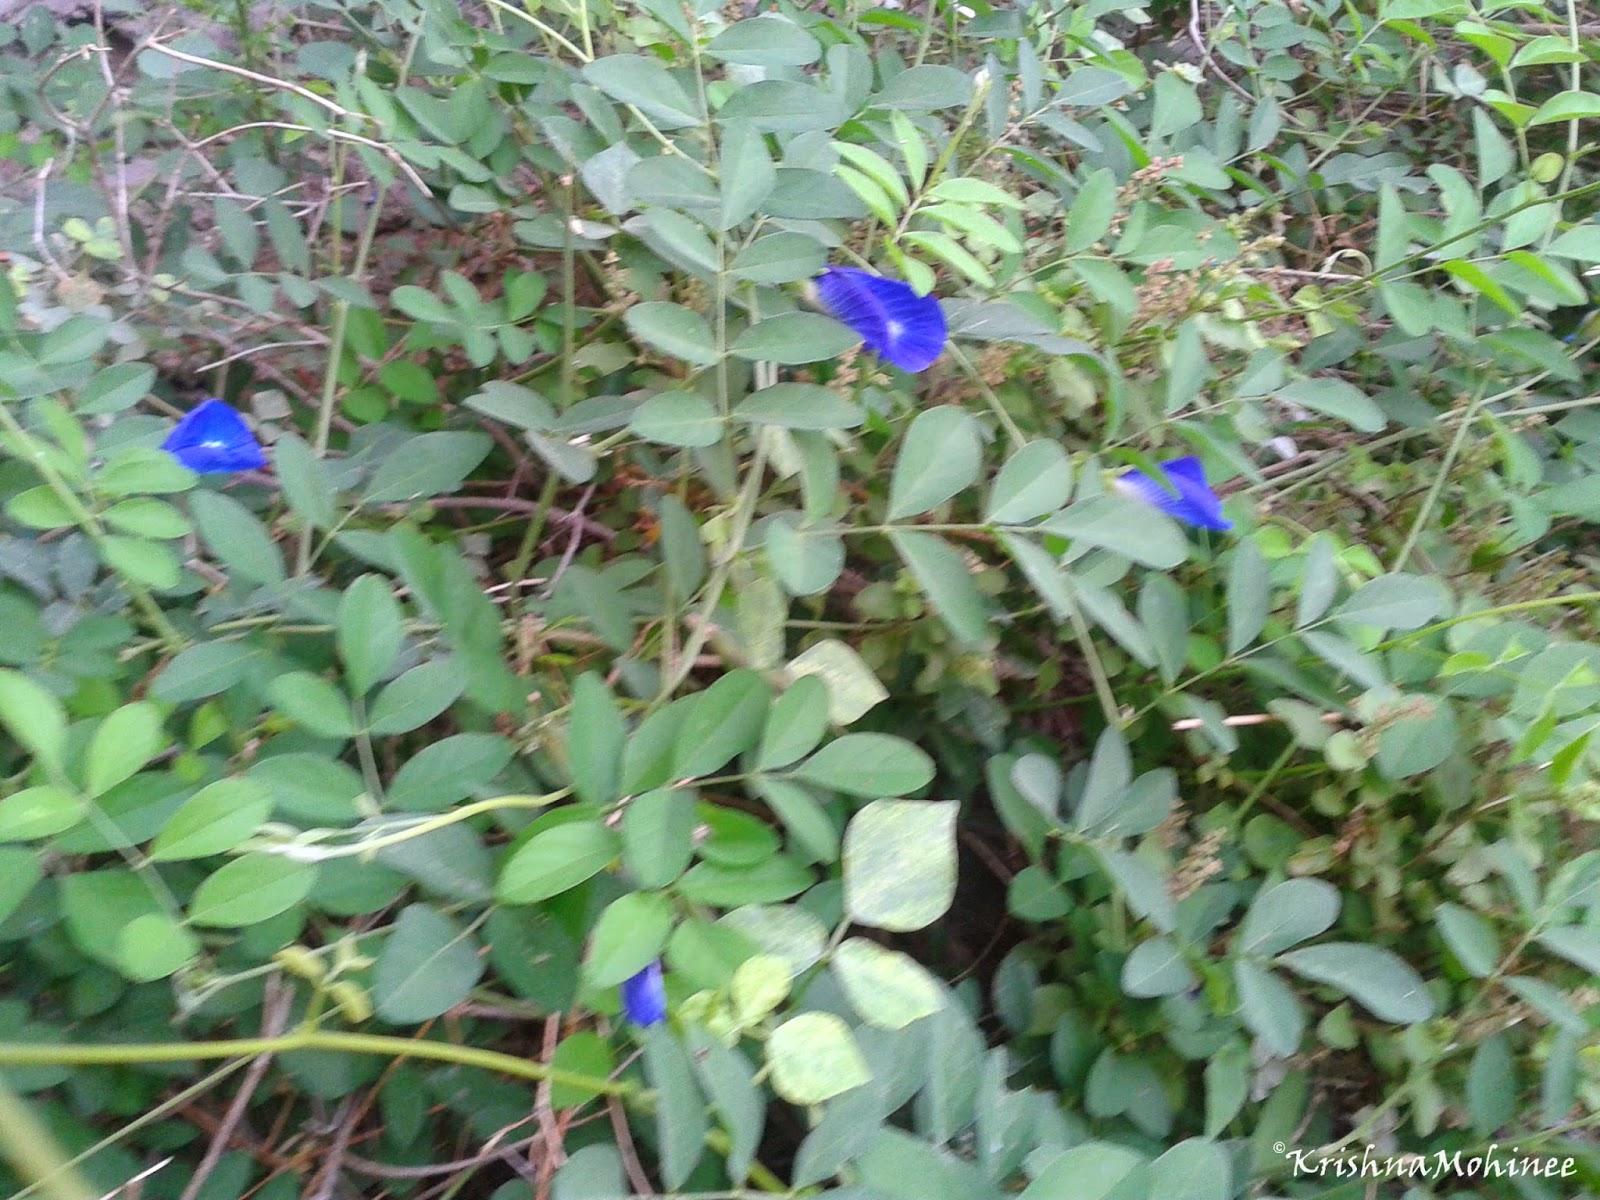 Image: Gokarna plant and flowers